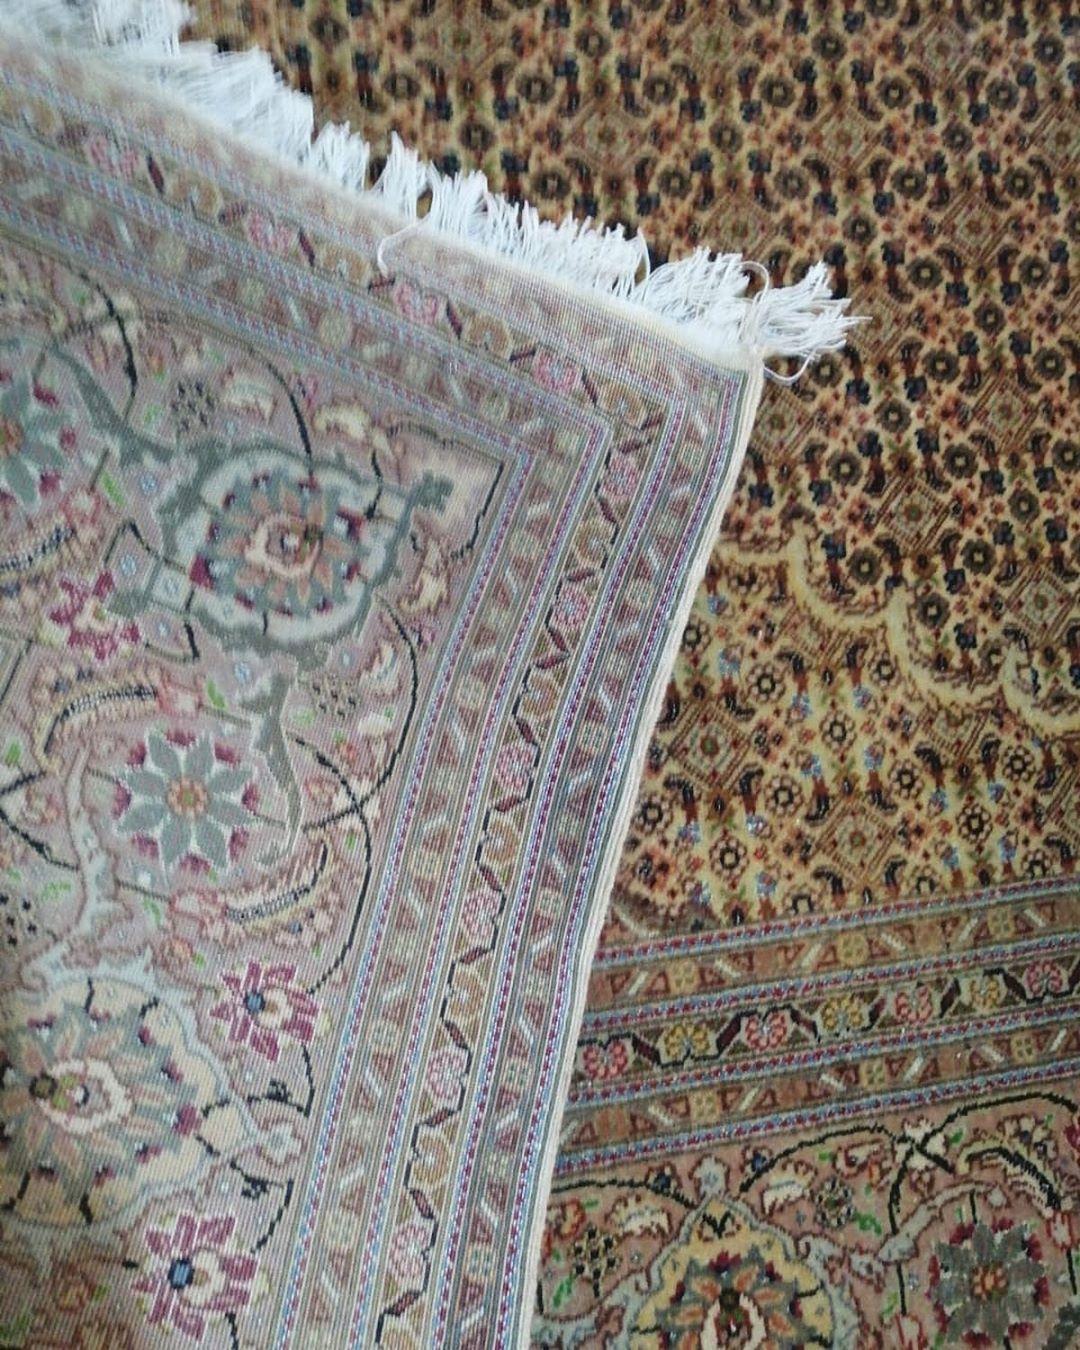 Machine Made Carpet Whoolen From Belgium Size 8 11 Dm For Price Details Pakistan Karachi Carpets Carpetlovers Rugs Handmaderugs Arearugs Customrugs Viscose rugs made in belgium